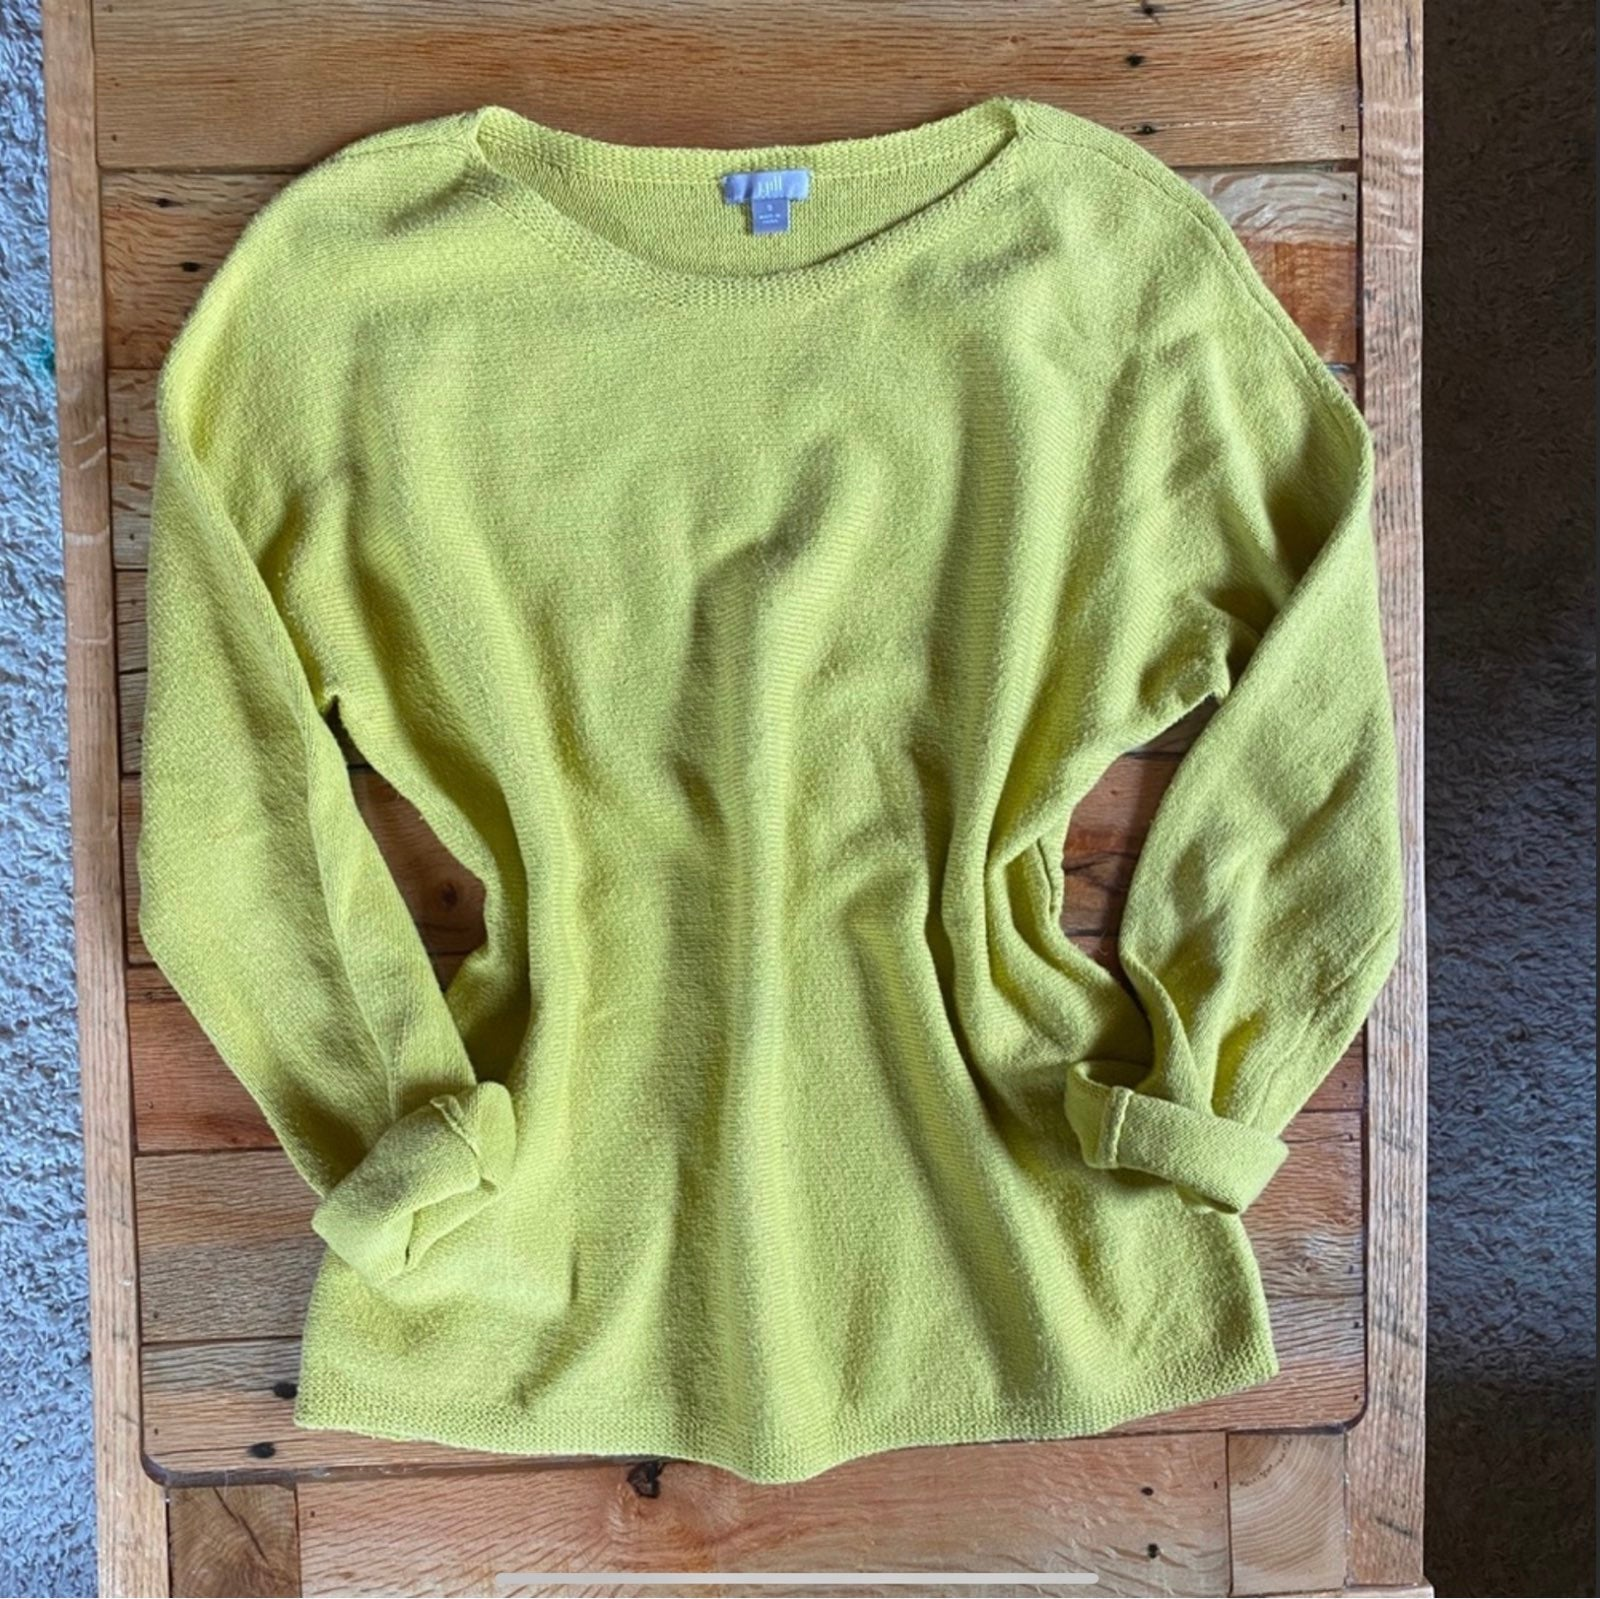 J. Jill Wool Blend Mustard Yellow Sweate